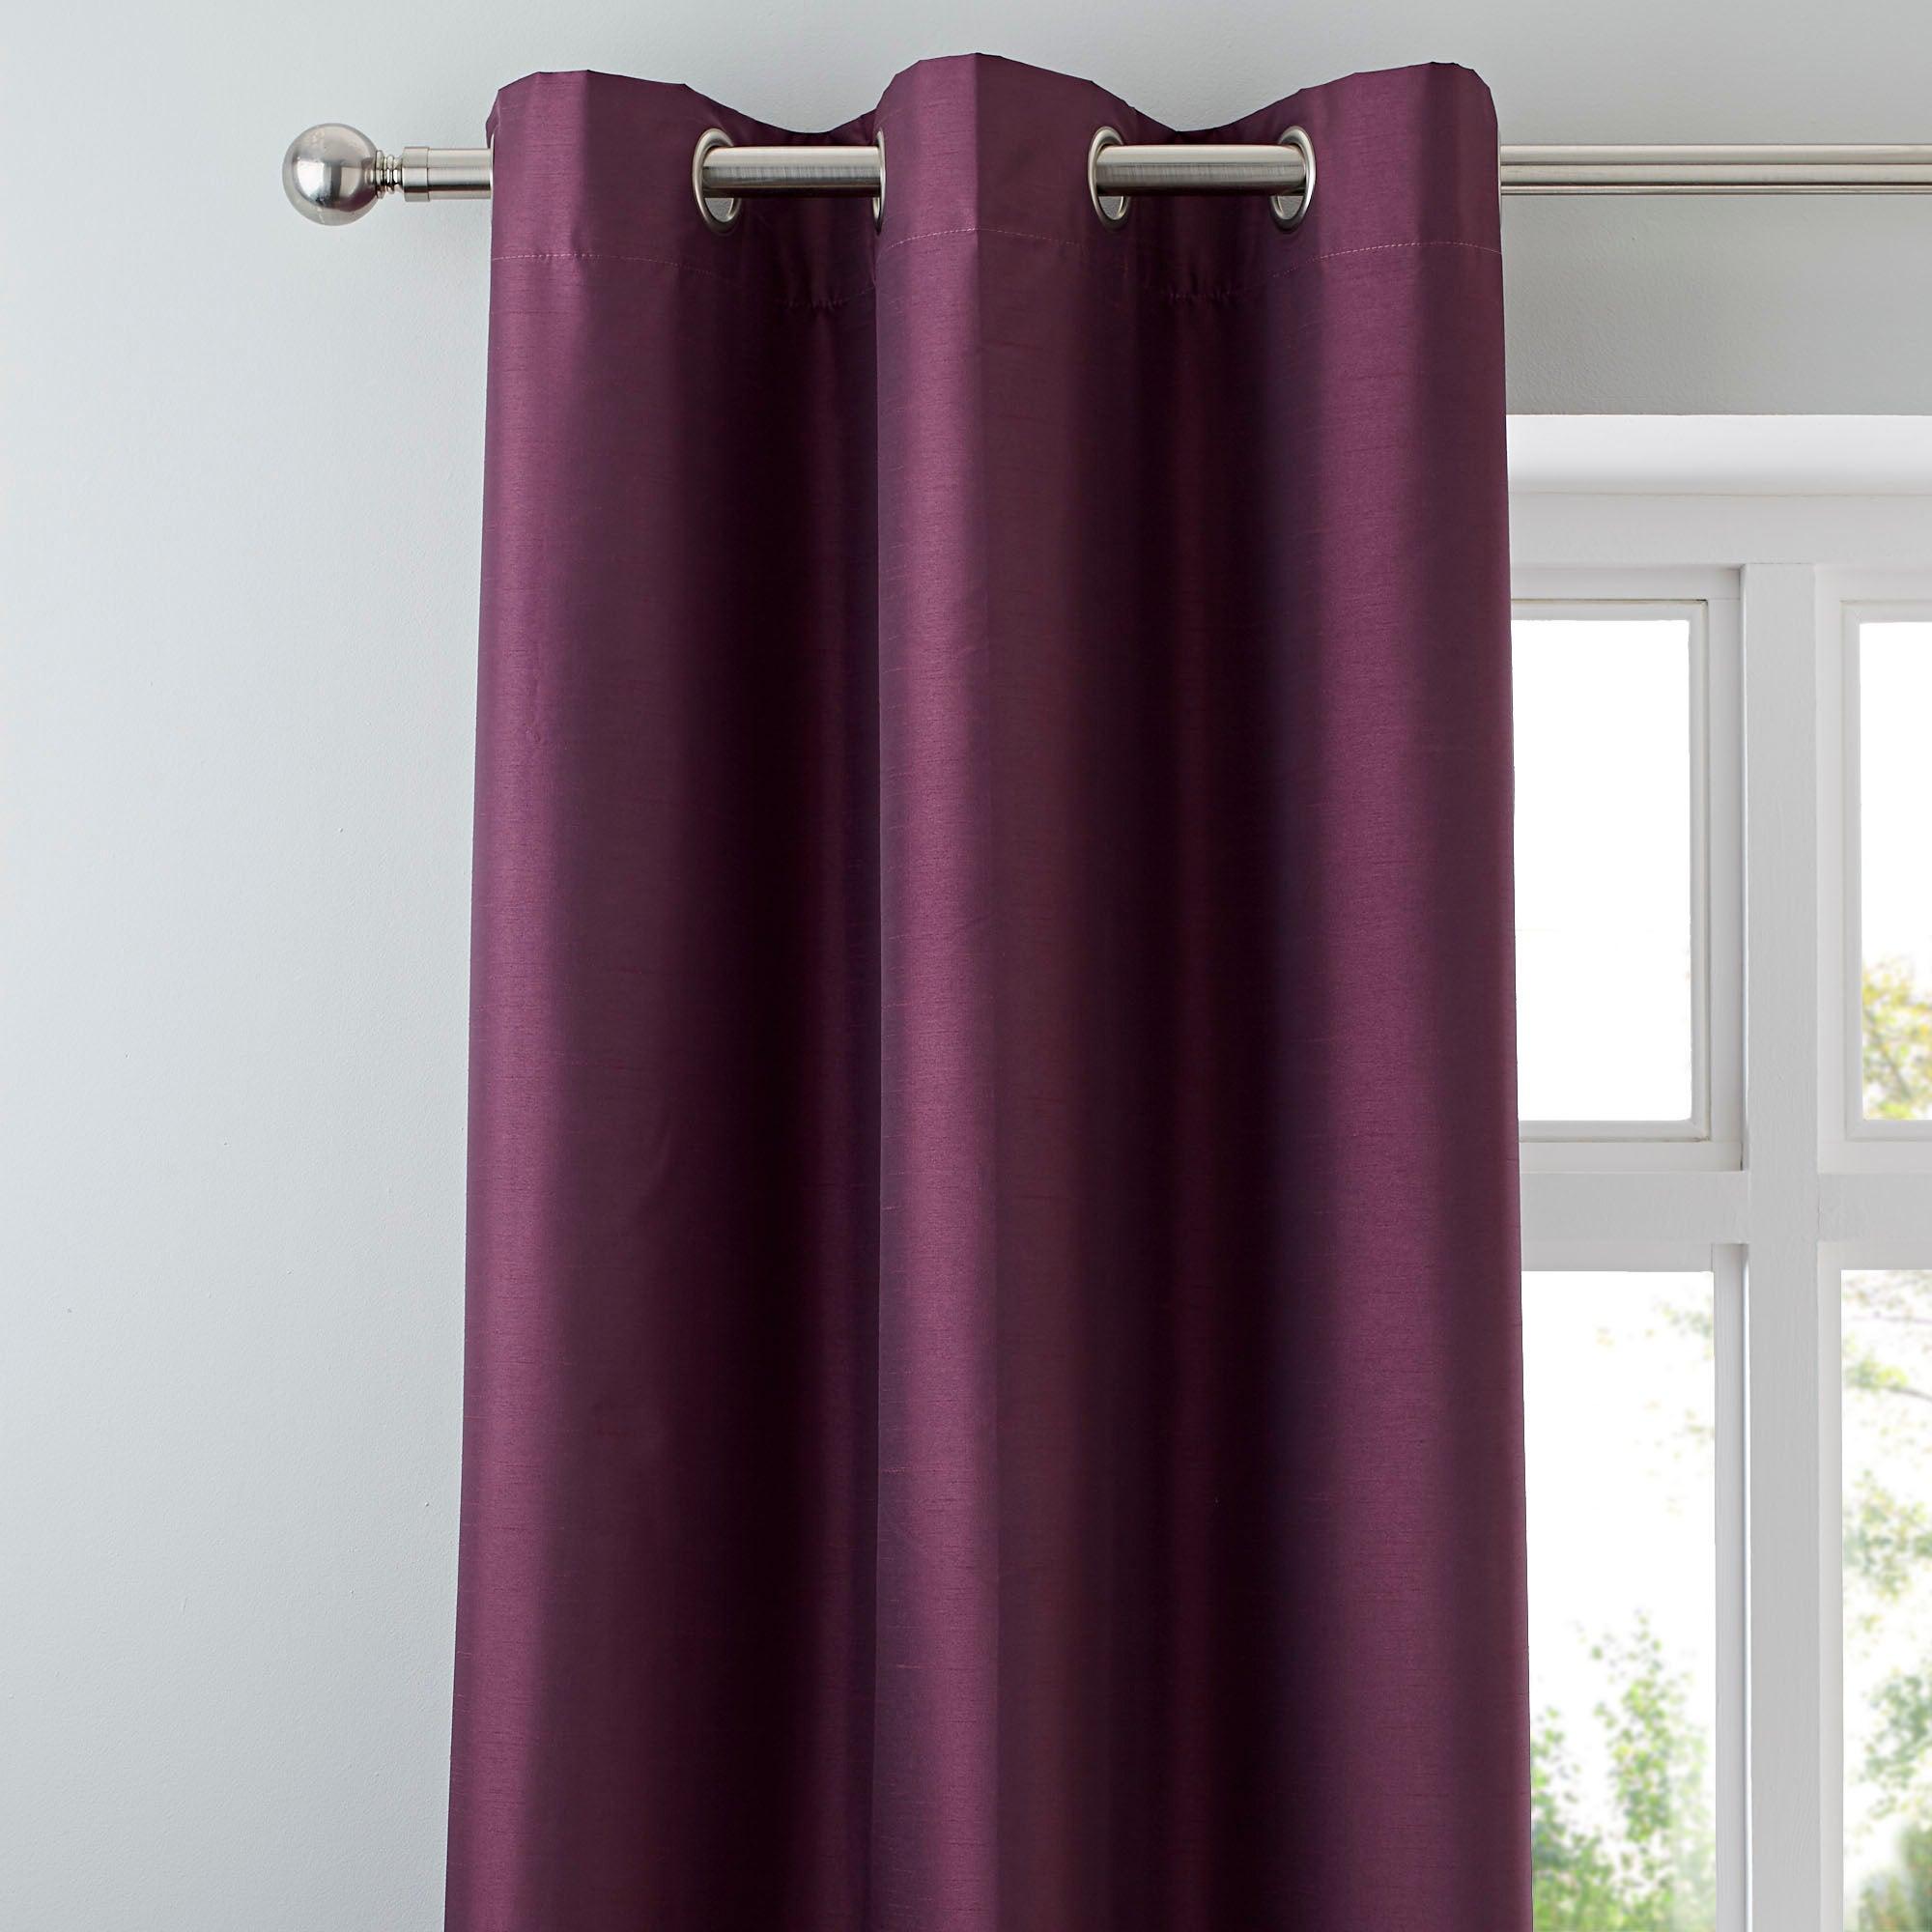 Aubergine Nova Blackout Lined Eyelet Curtains